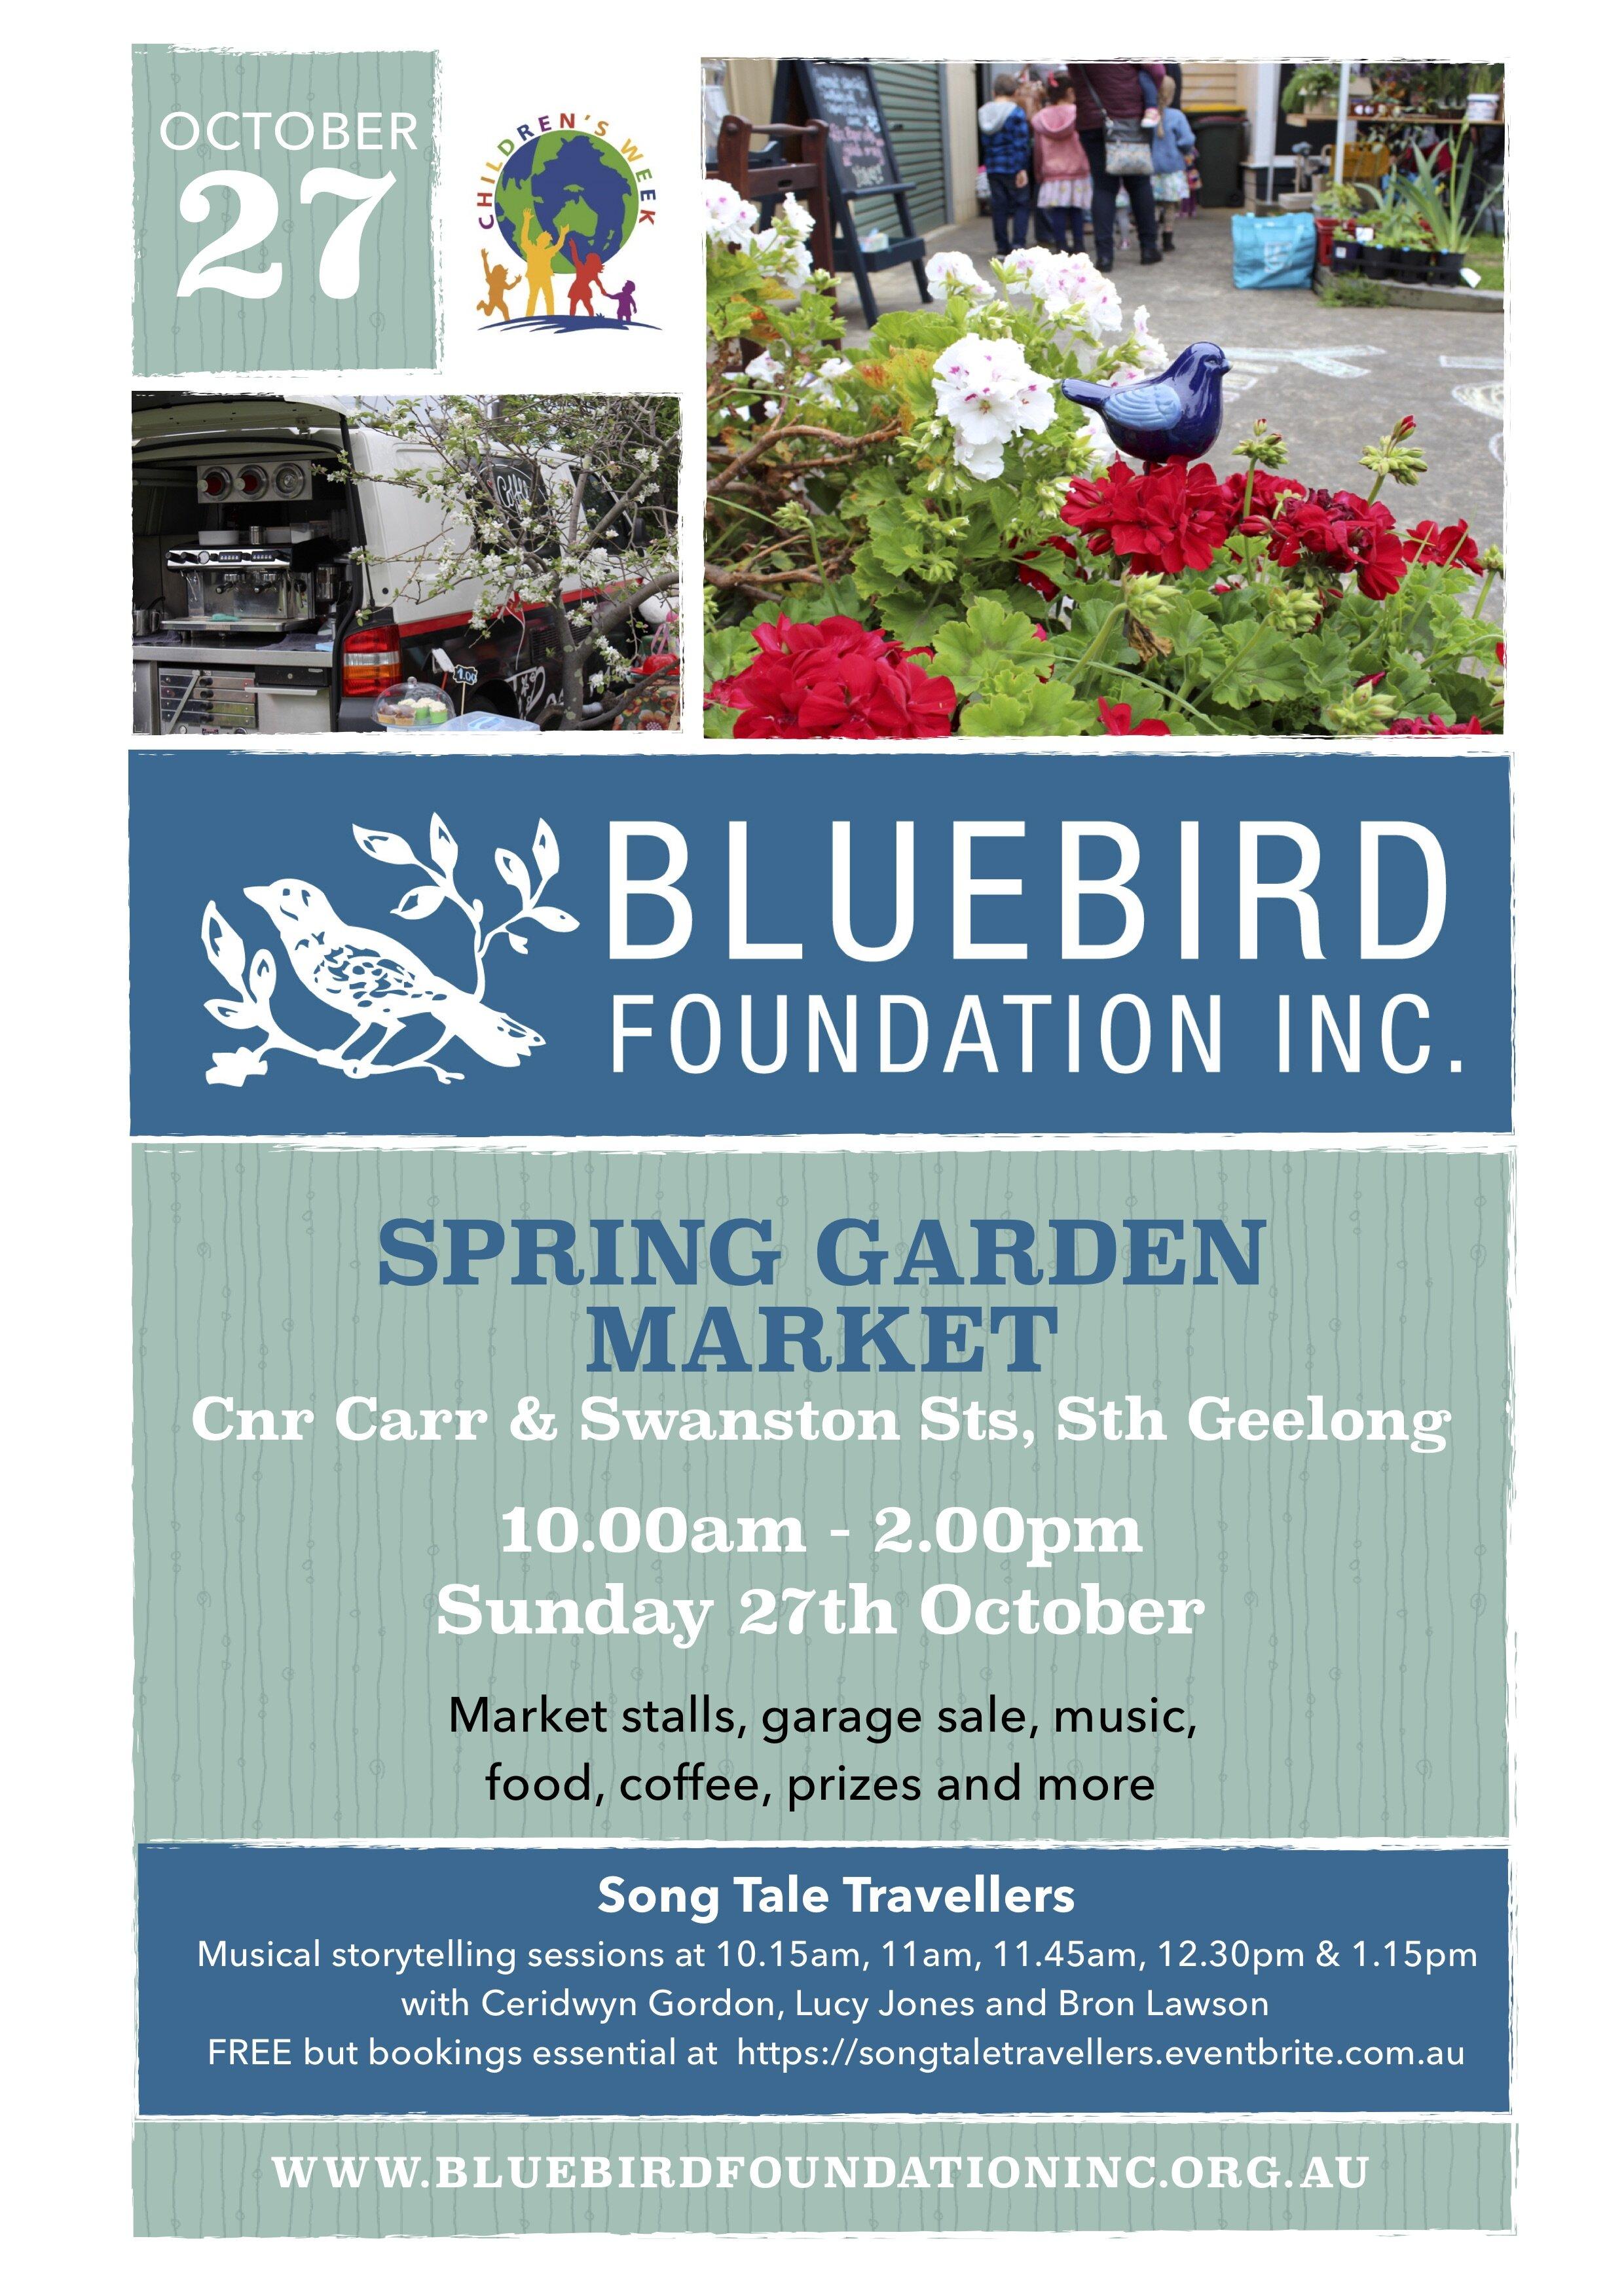 Garden Market flyer.jpg